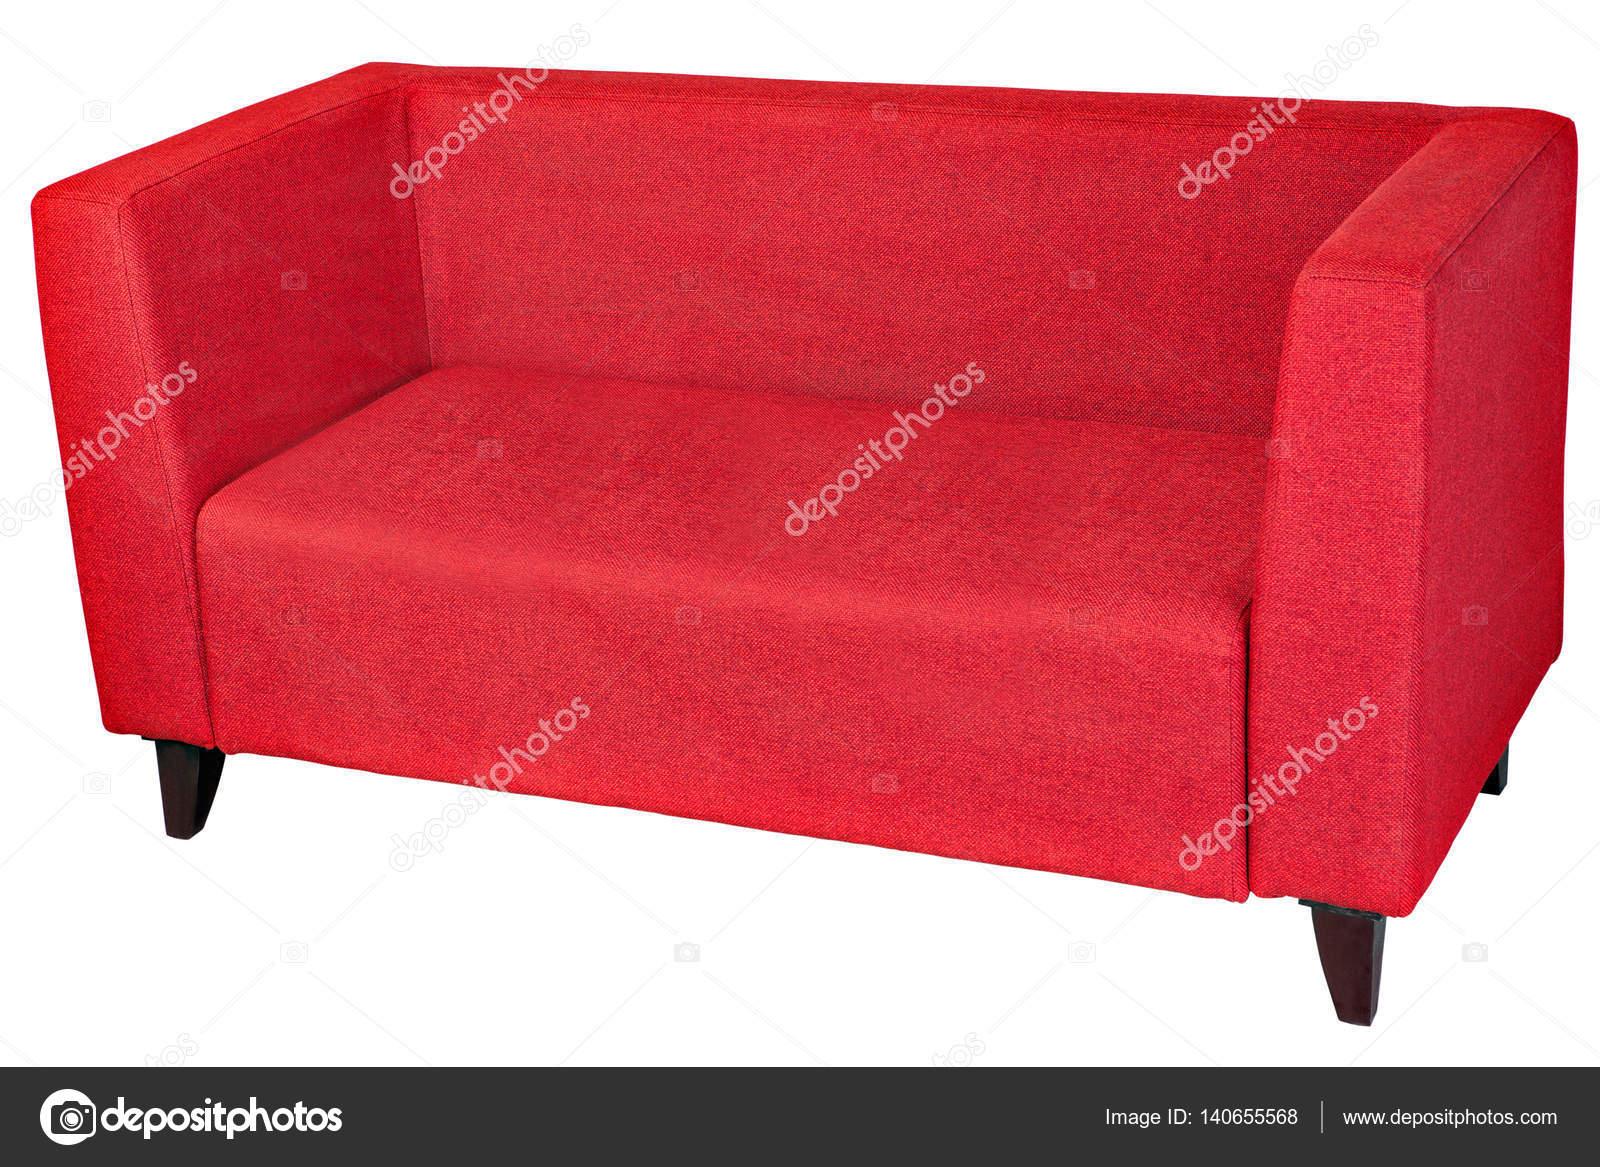 Polstermöbel 2 Sitzer Sofa in rotem Stoff mit Holzbeinen — Stockfoto ...